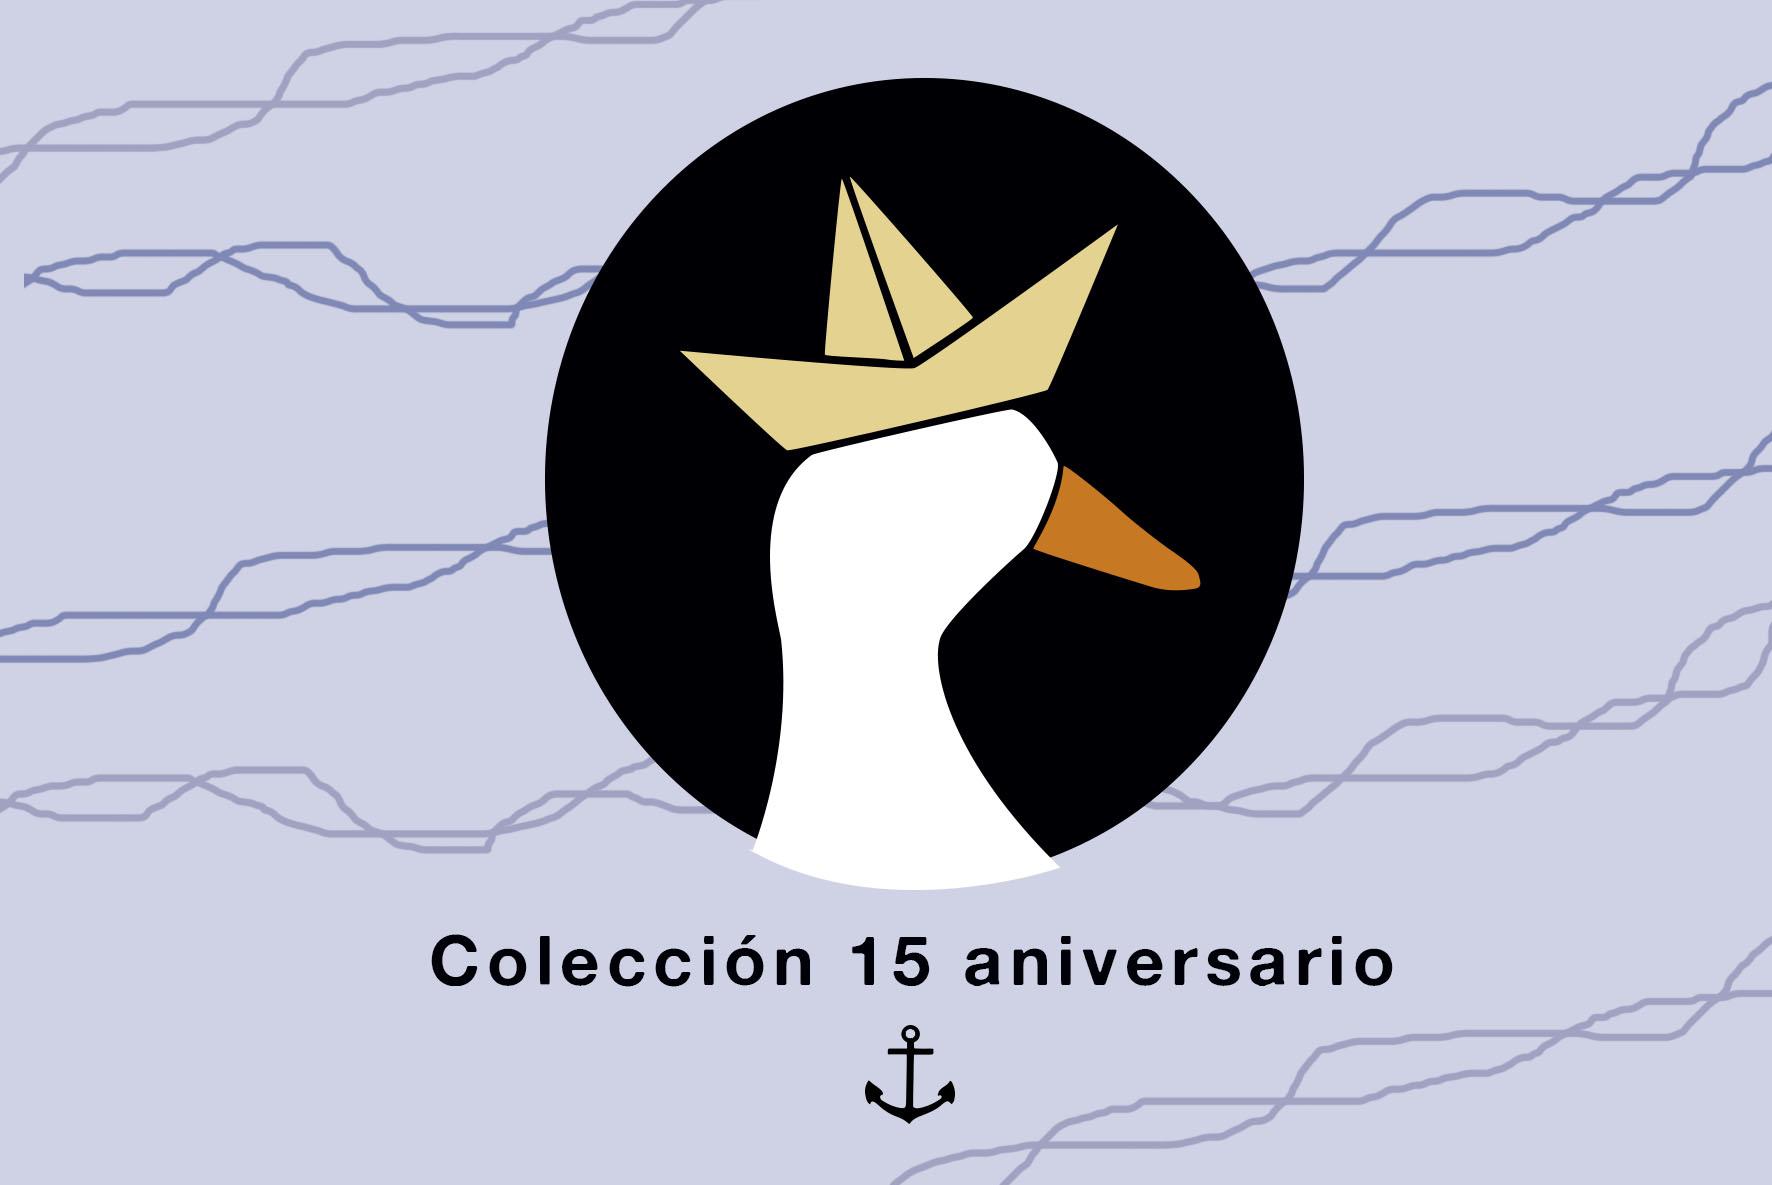 coleccion 15 aniversario